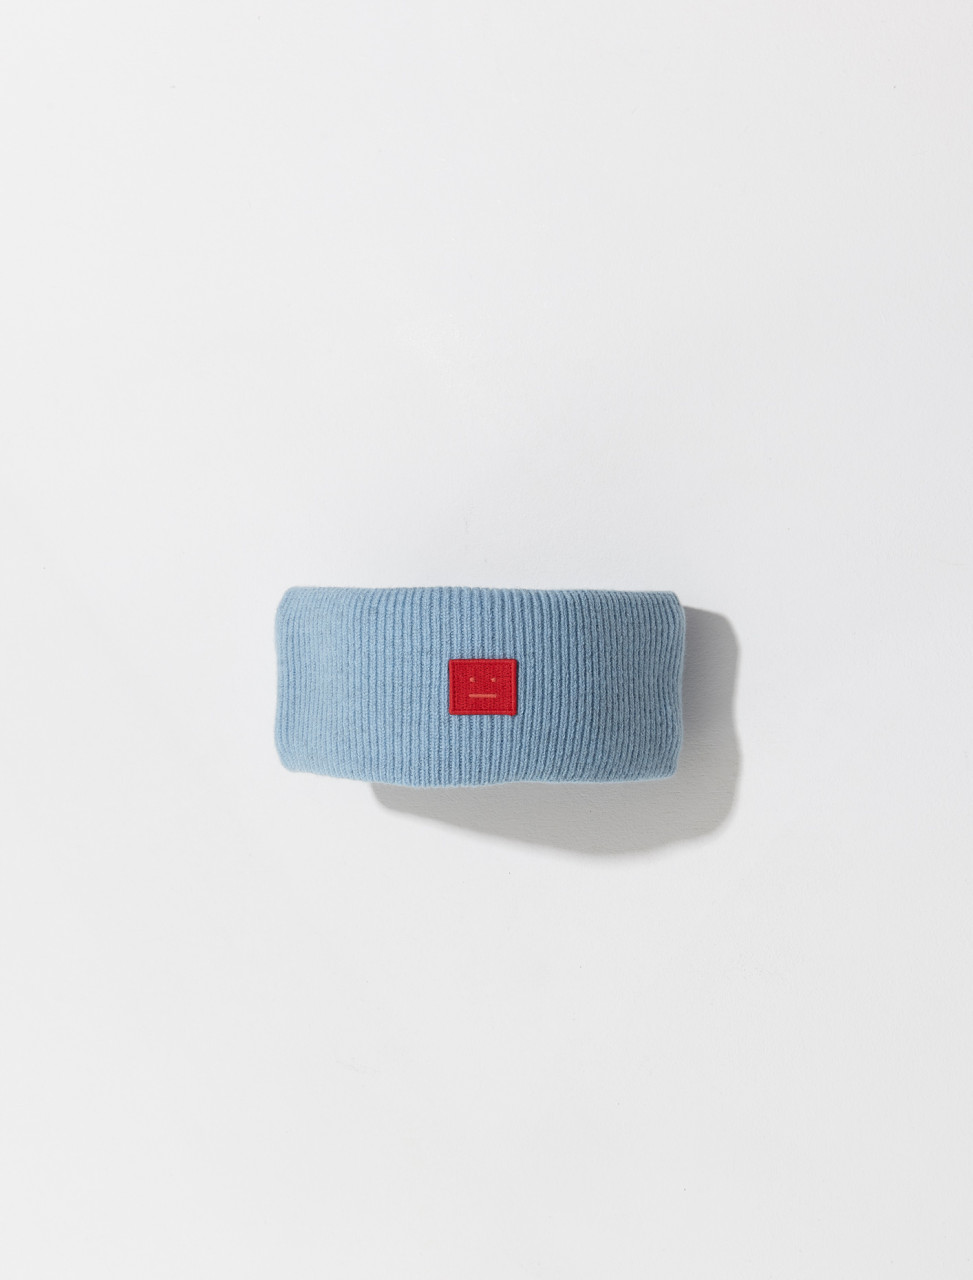 C40159 AQO FA UX HAT000098 ACNE STUDIOS FANCY FACE SWEATBAND IN POWDER BLUE